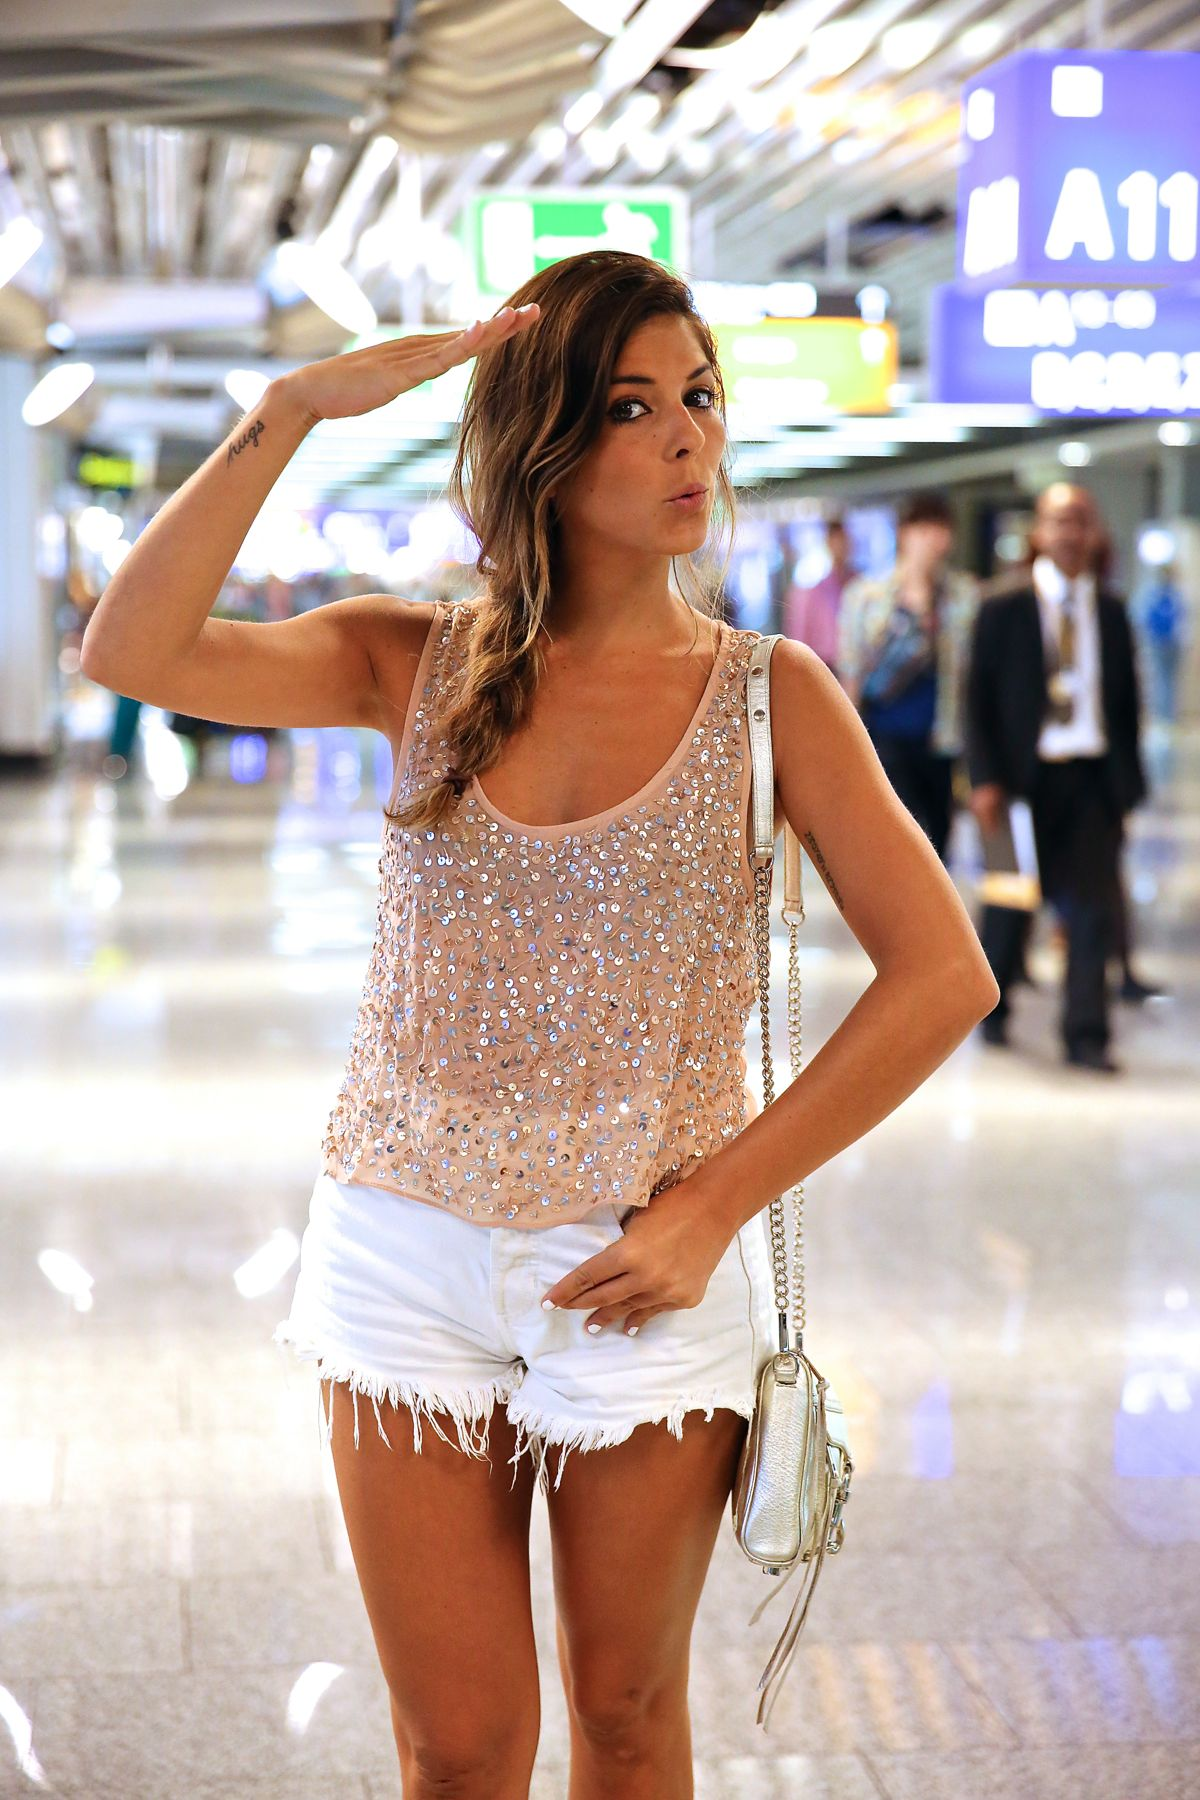 trendy_taste-look-outfit-street_style-ootd-blog-blogger-fashion_spain-moda_españa-traveling-viaje-frankfurt-stan_smith-adidas-lentejuelas-top-denim-shorts-vaqueros_rotos-12